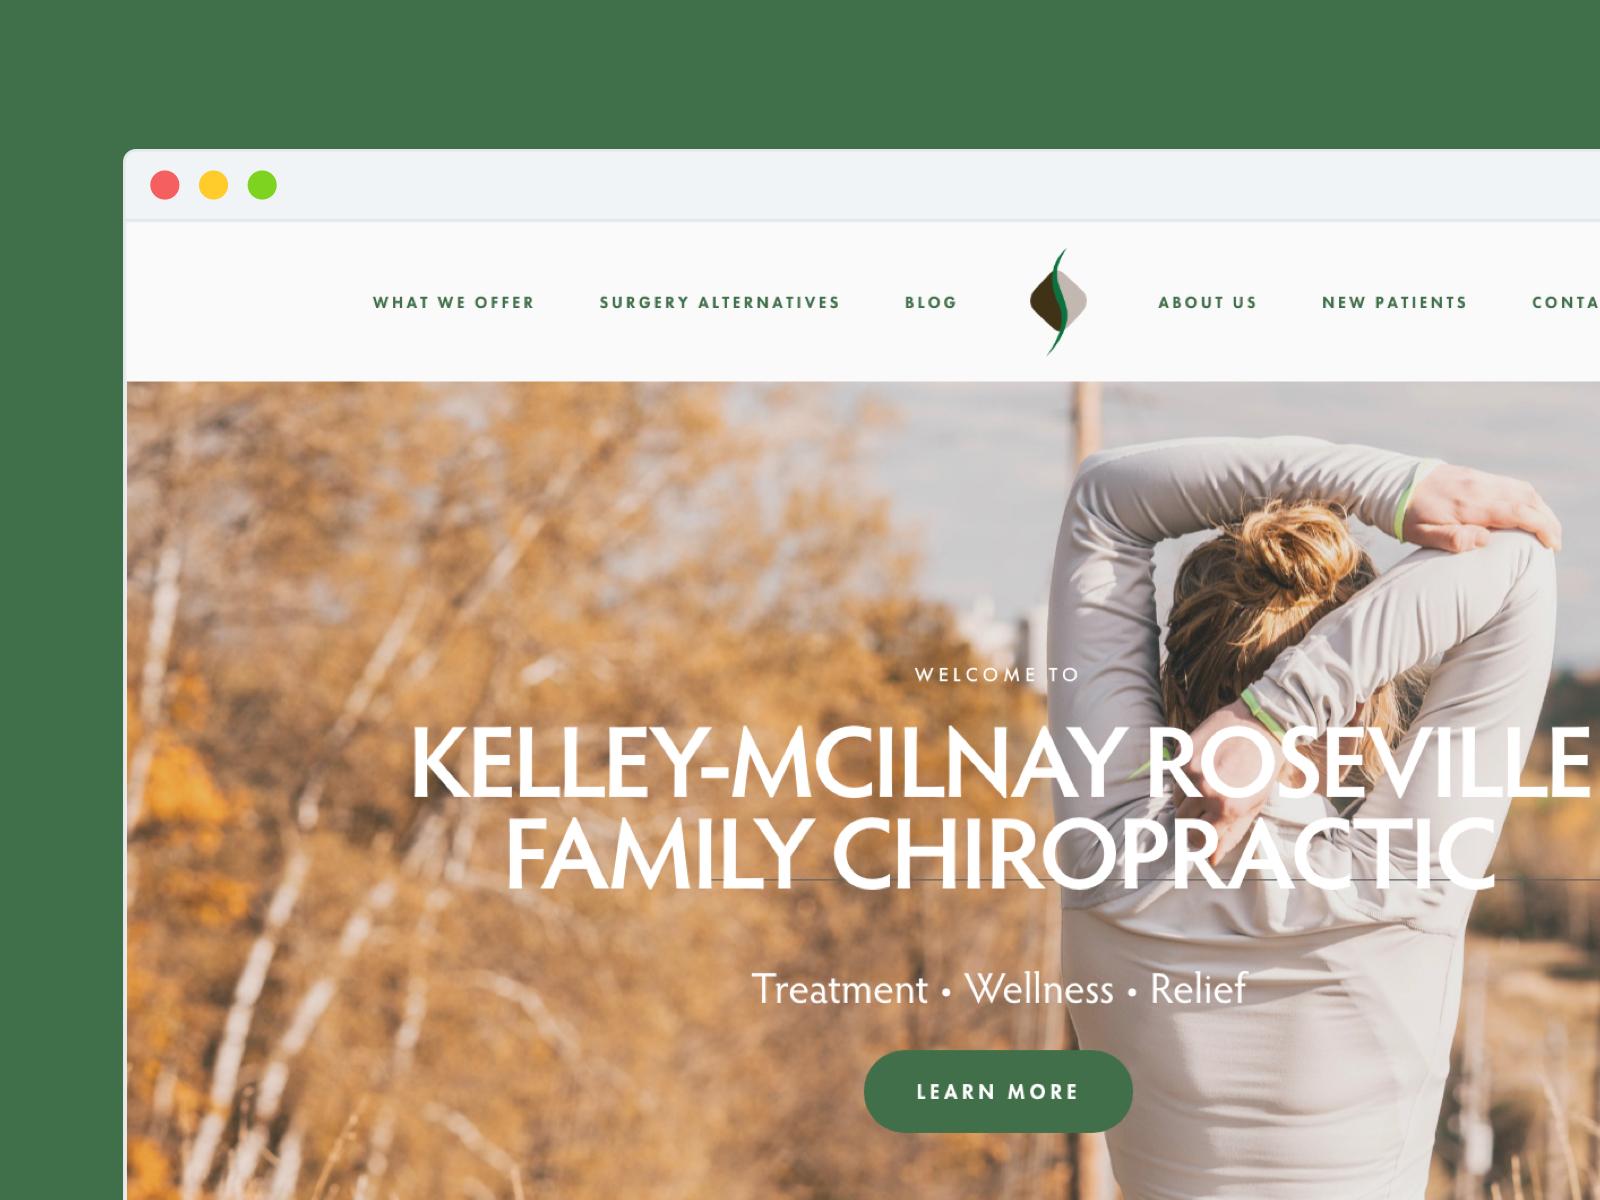 Kelley McIlnay Chiropractic